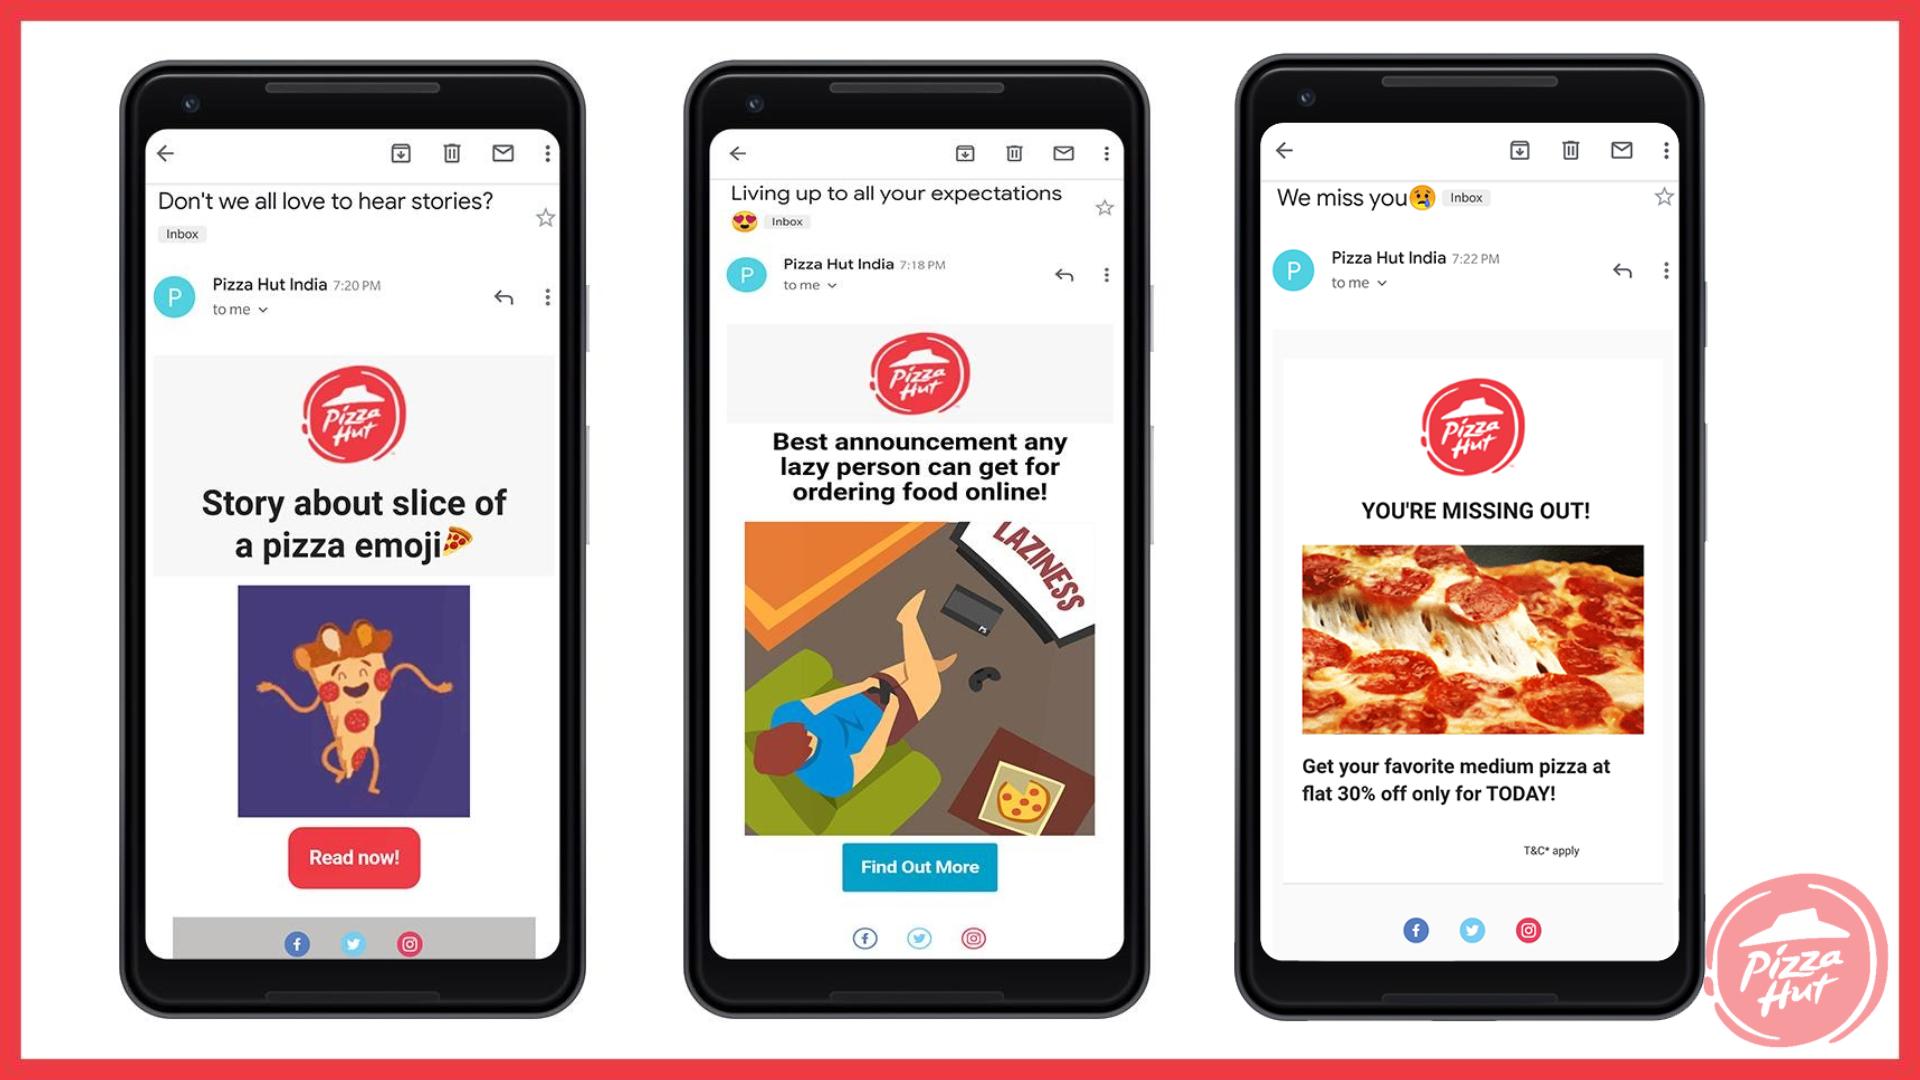 pizza hut marketing strategy Email Marketing 1 - Pizza Hut Marketing and Advertising Strategy